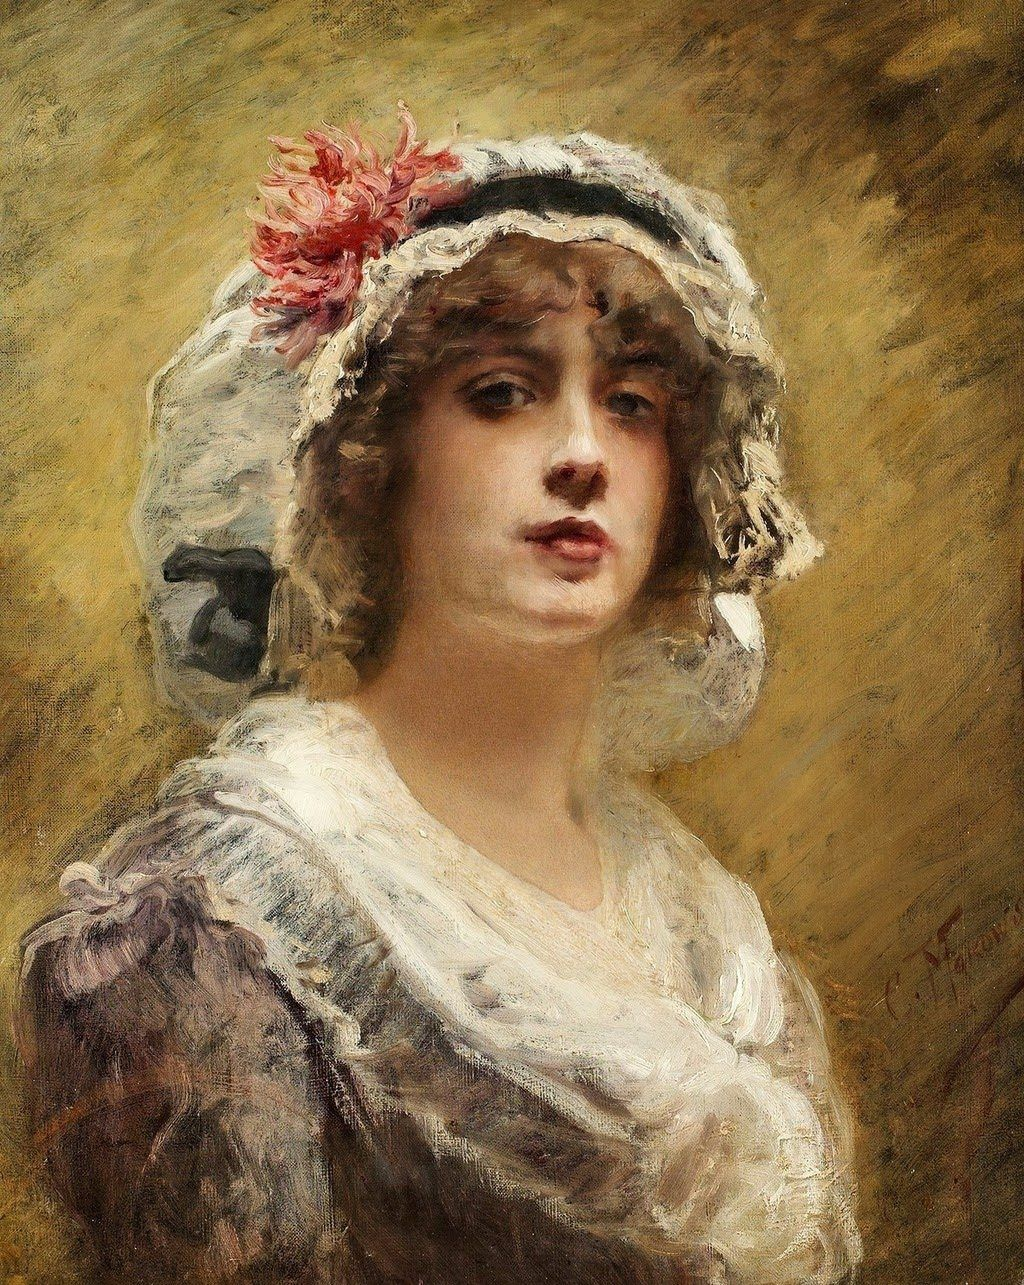 Портрет живопись картинки